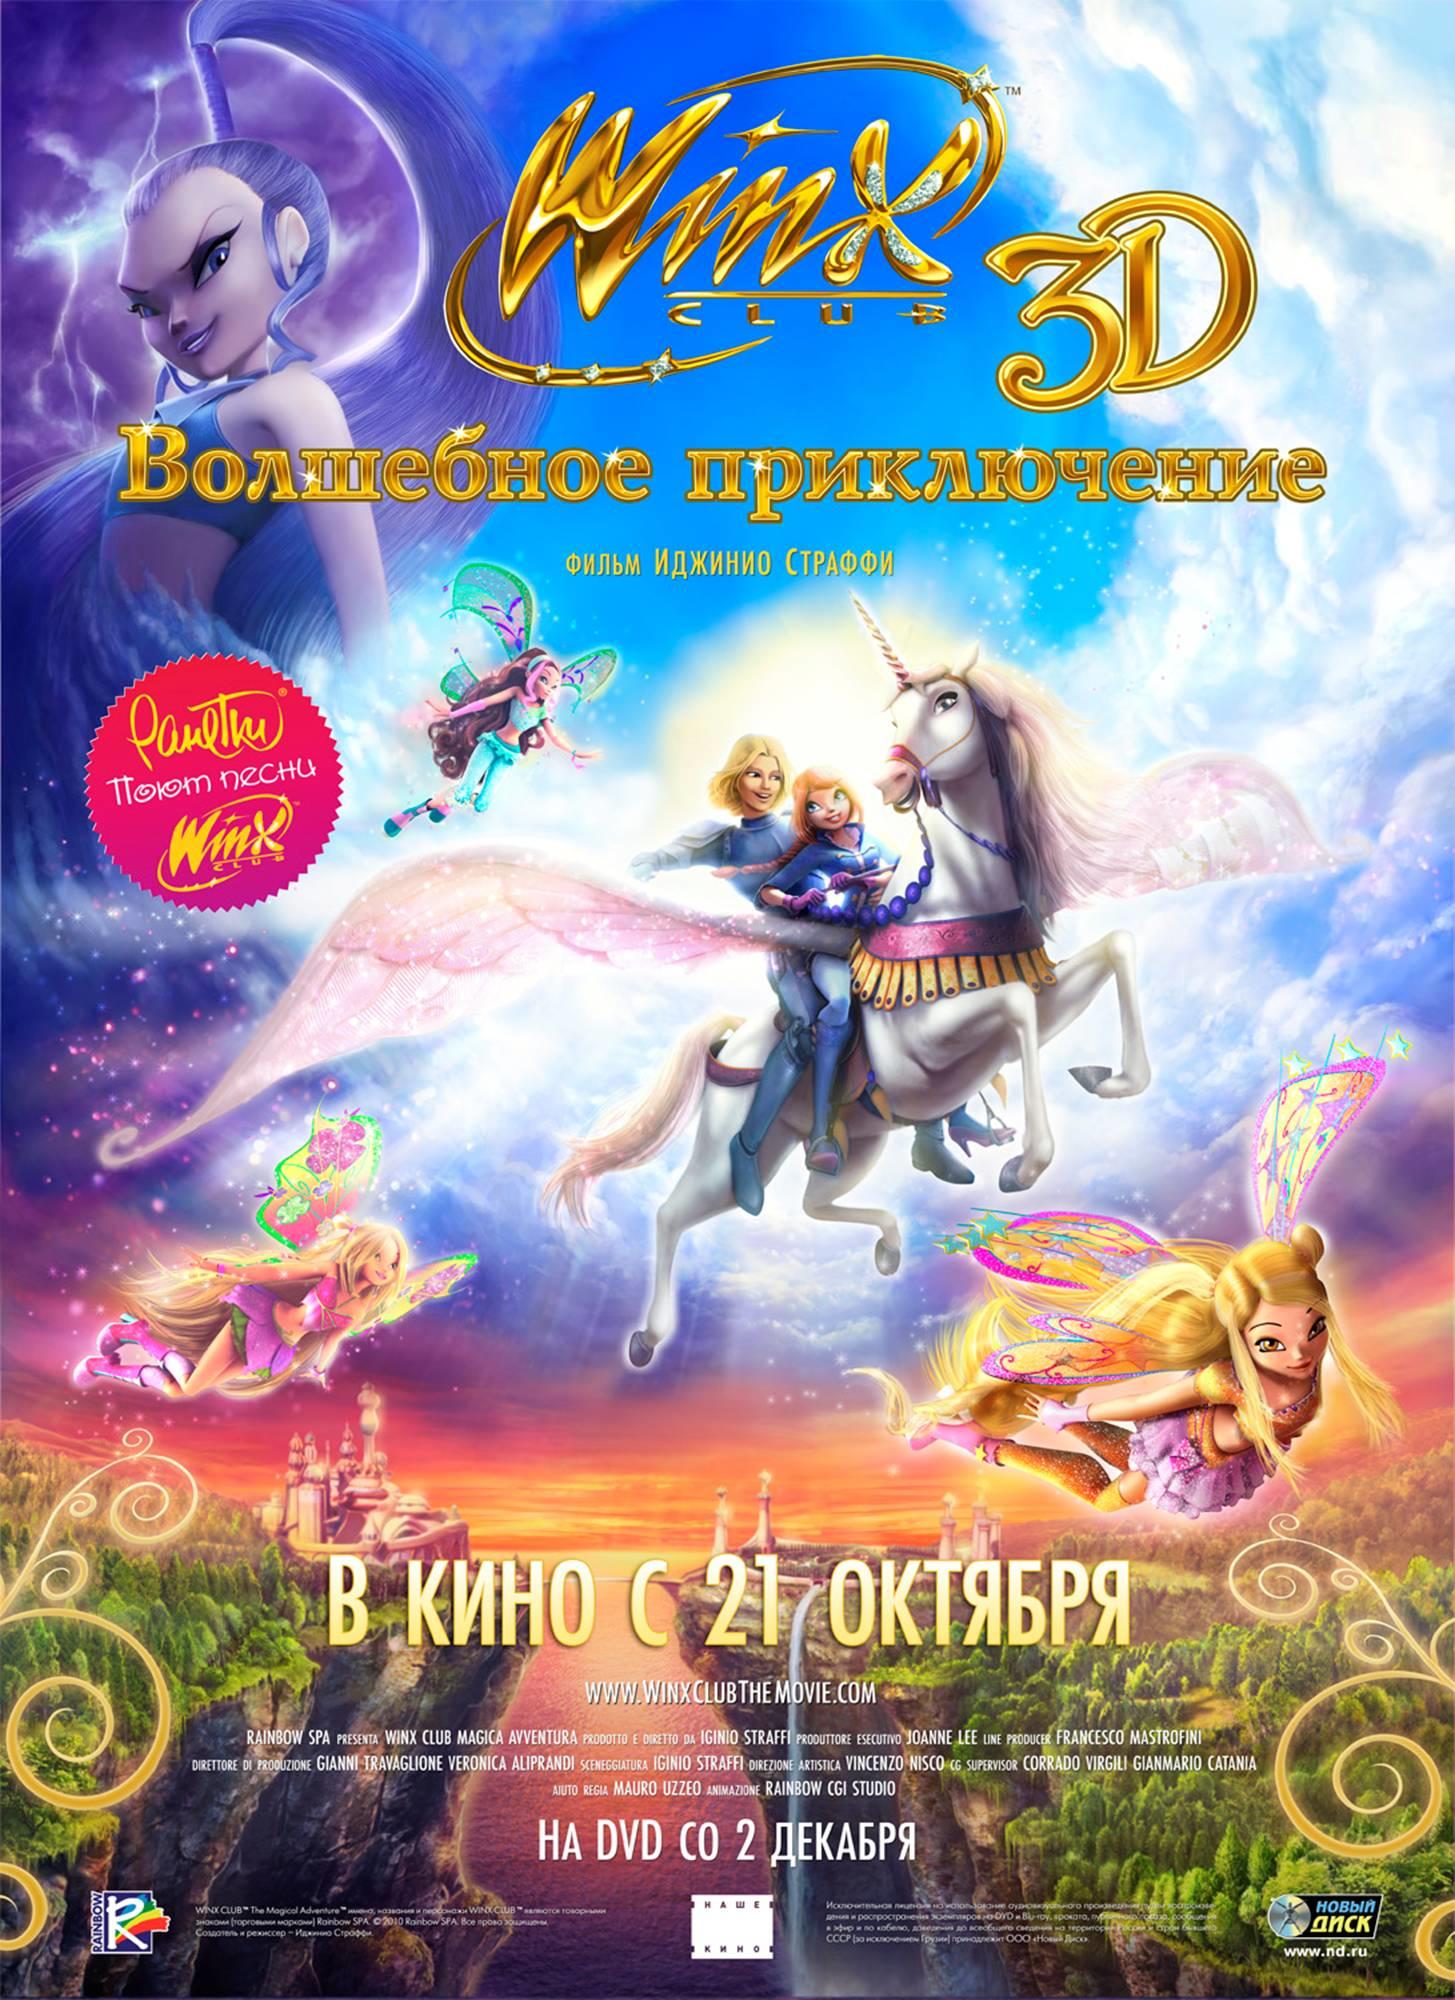 Клуб Винкс 3D: Волшебное приключение